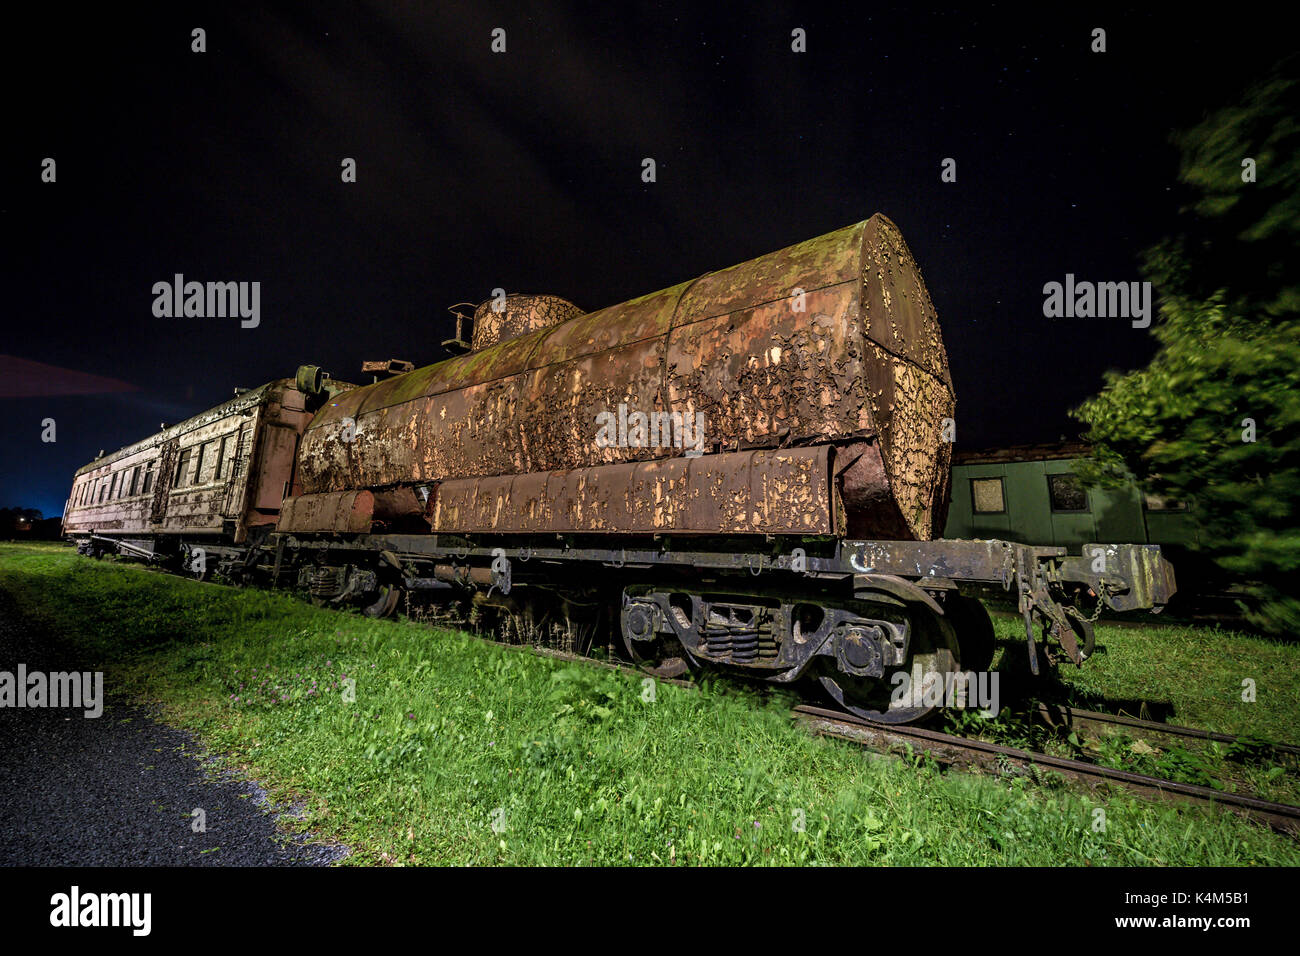 Decayed locomotive car at night - Stock Image